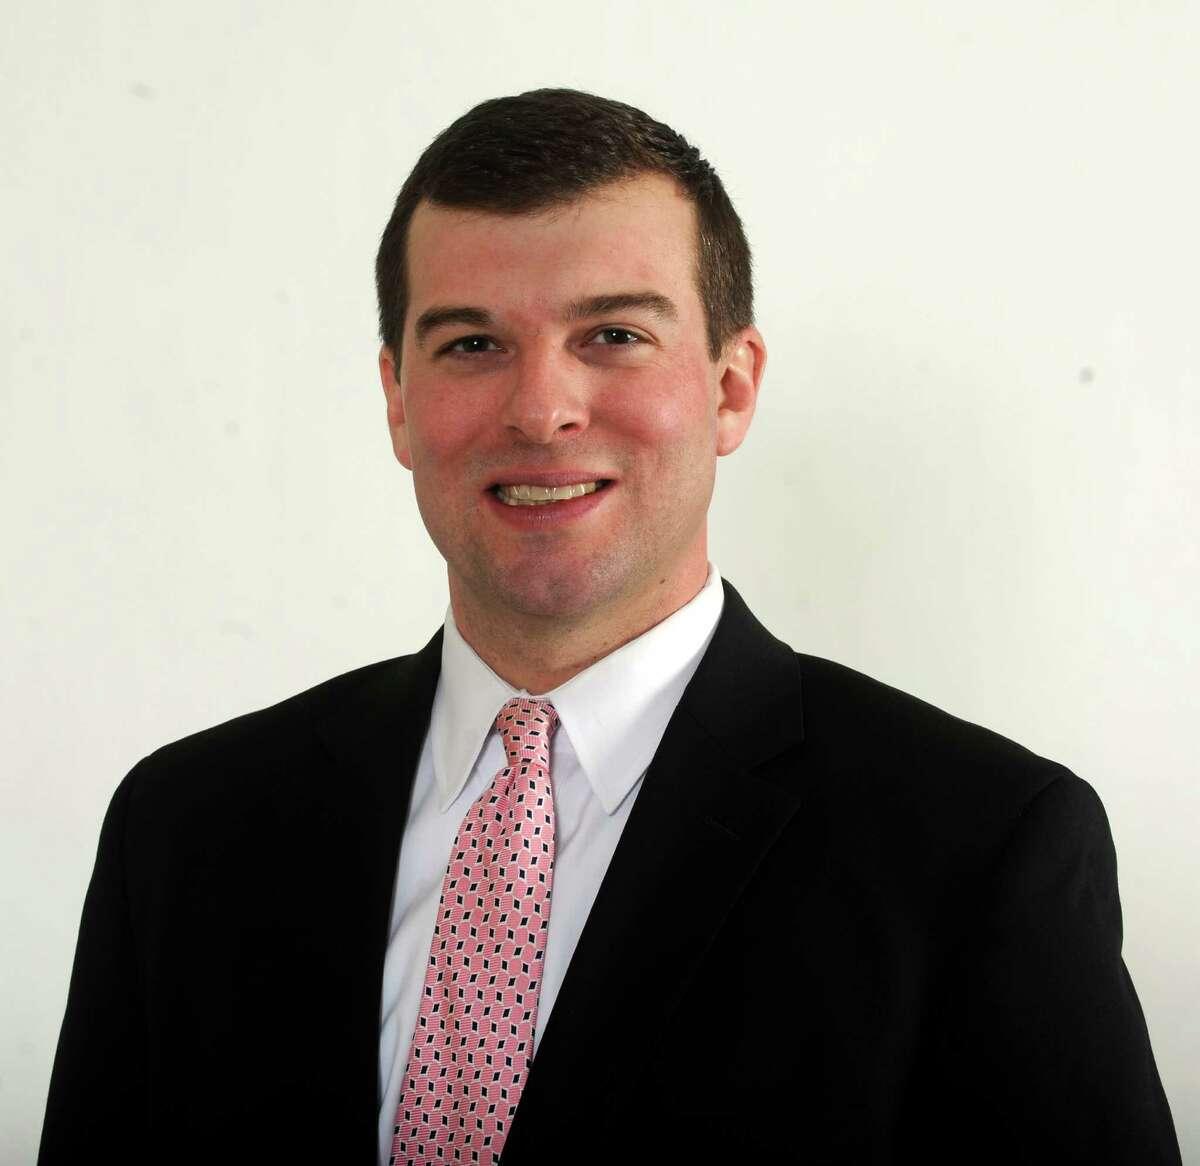 Rep. Steve Stafstrom, D-Bridgeport, will hold office hours in the city's Black Rock neighborhood next week.